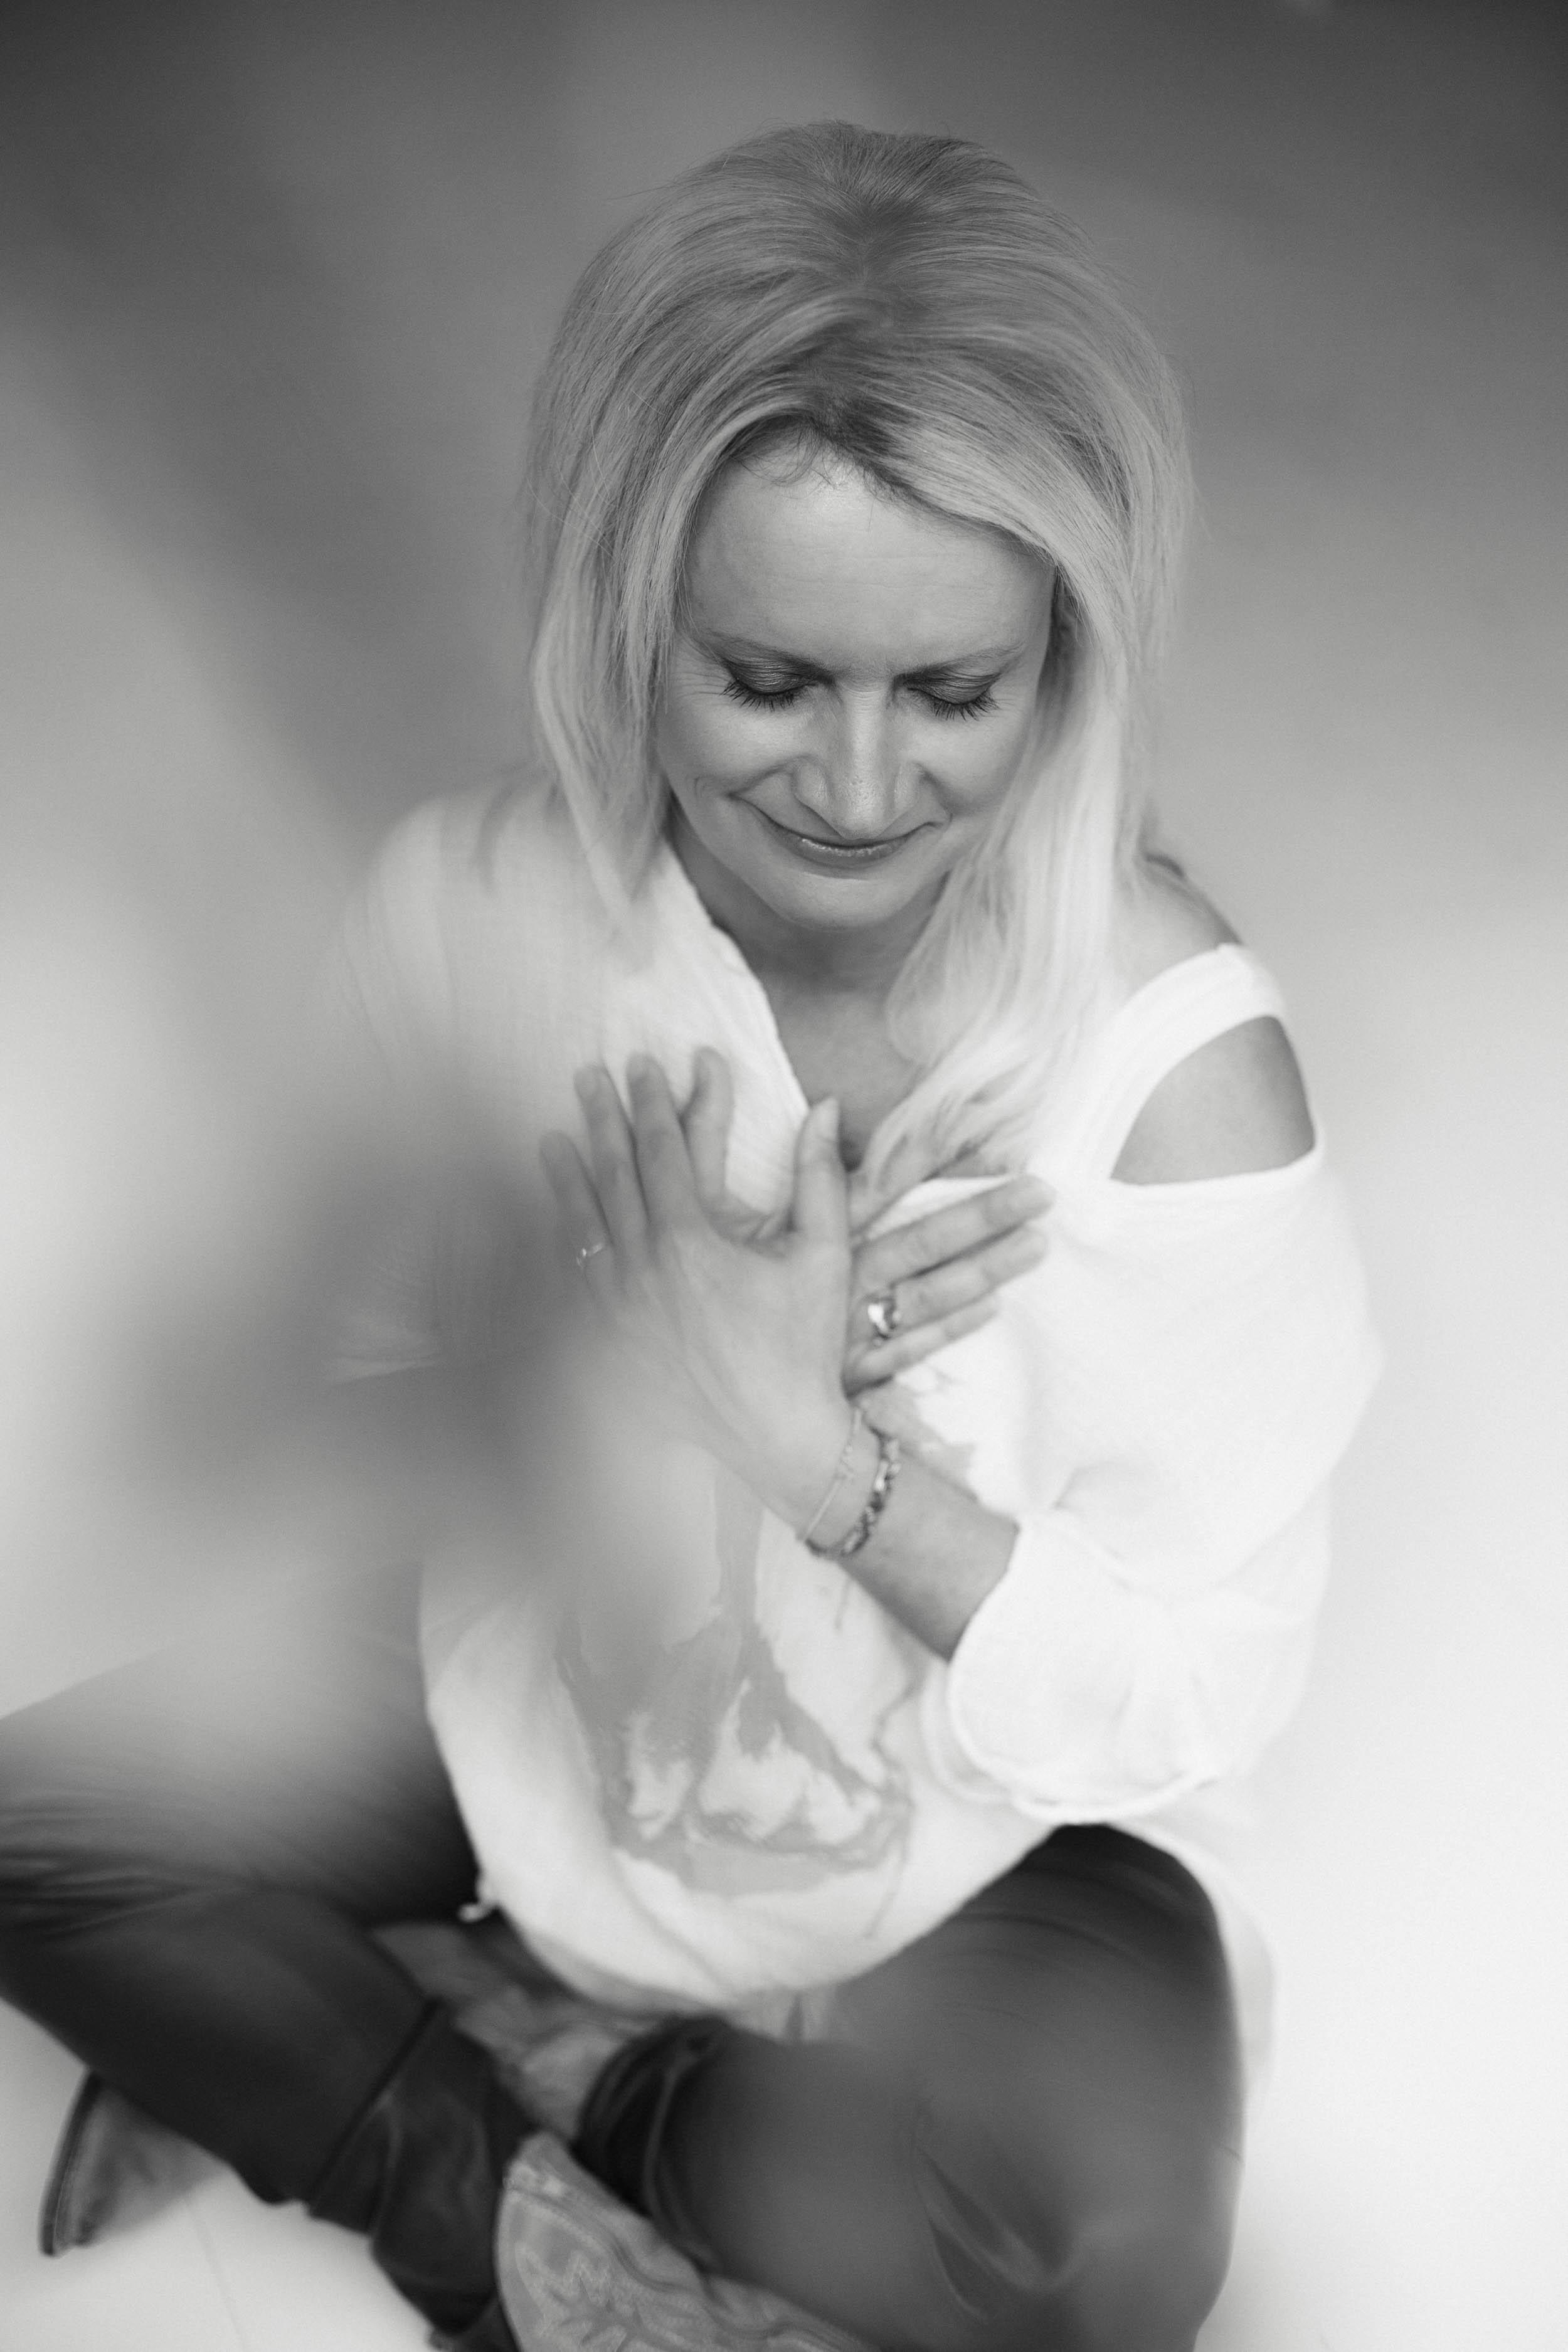 psykoterapi Fyn - psykoterapi Odense - psykoterapi Svendborg